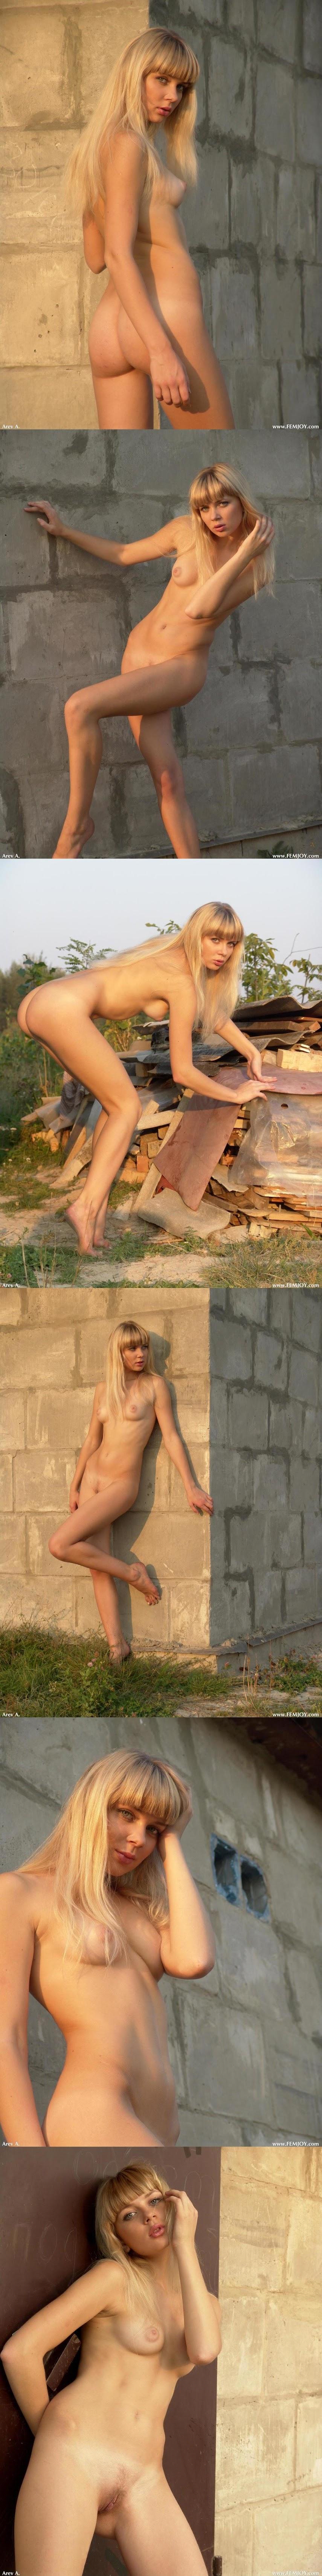 FEdf  - 2005-12-07 - Nana - Crest x60 3000px sexy girls image jav